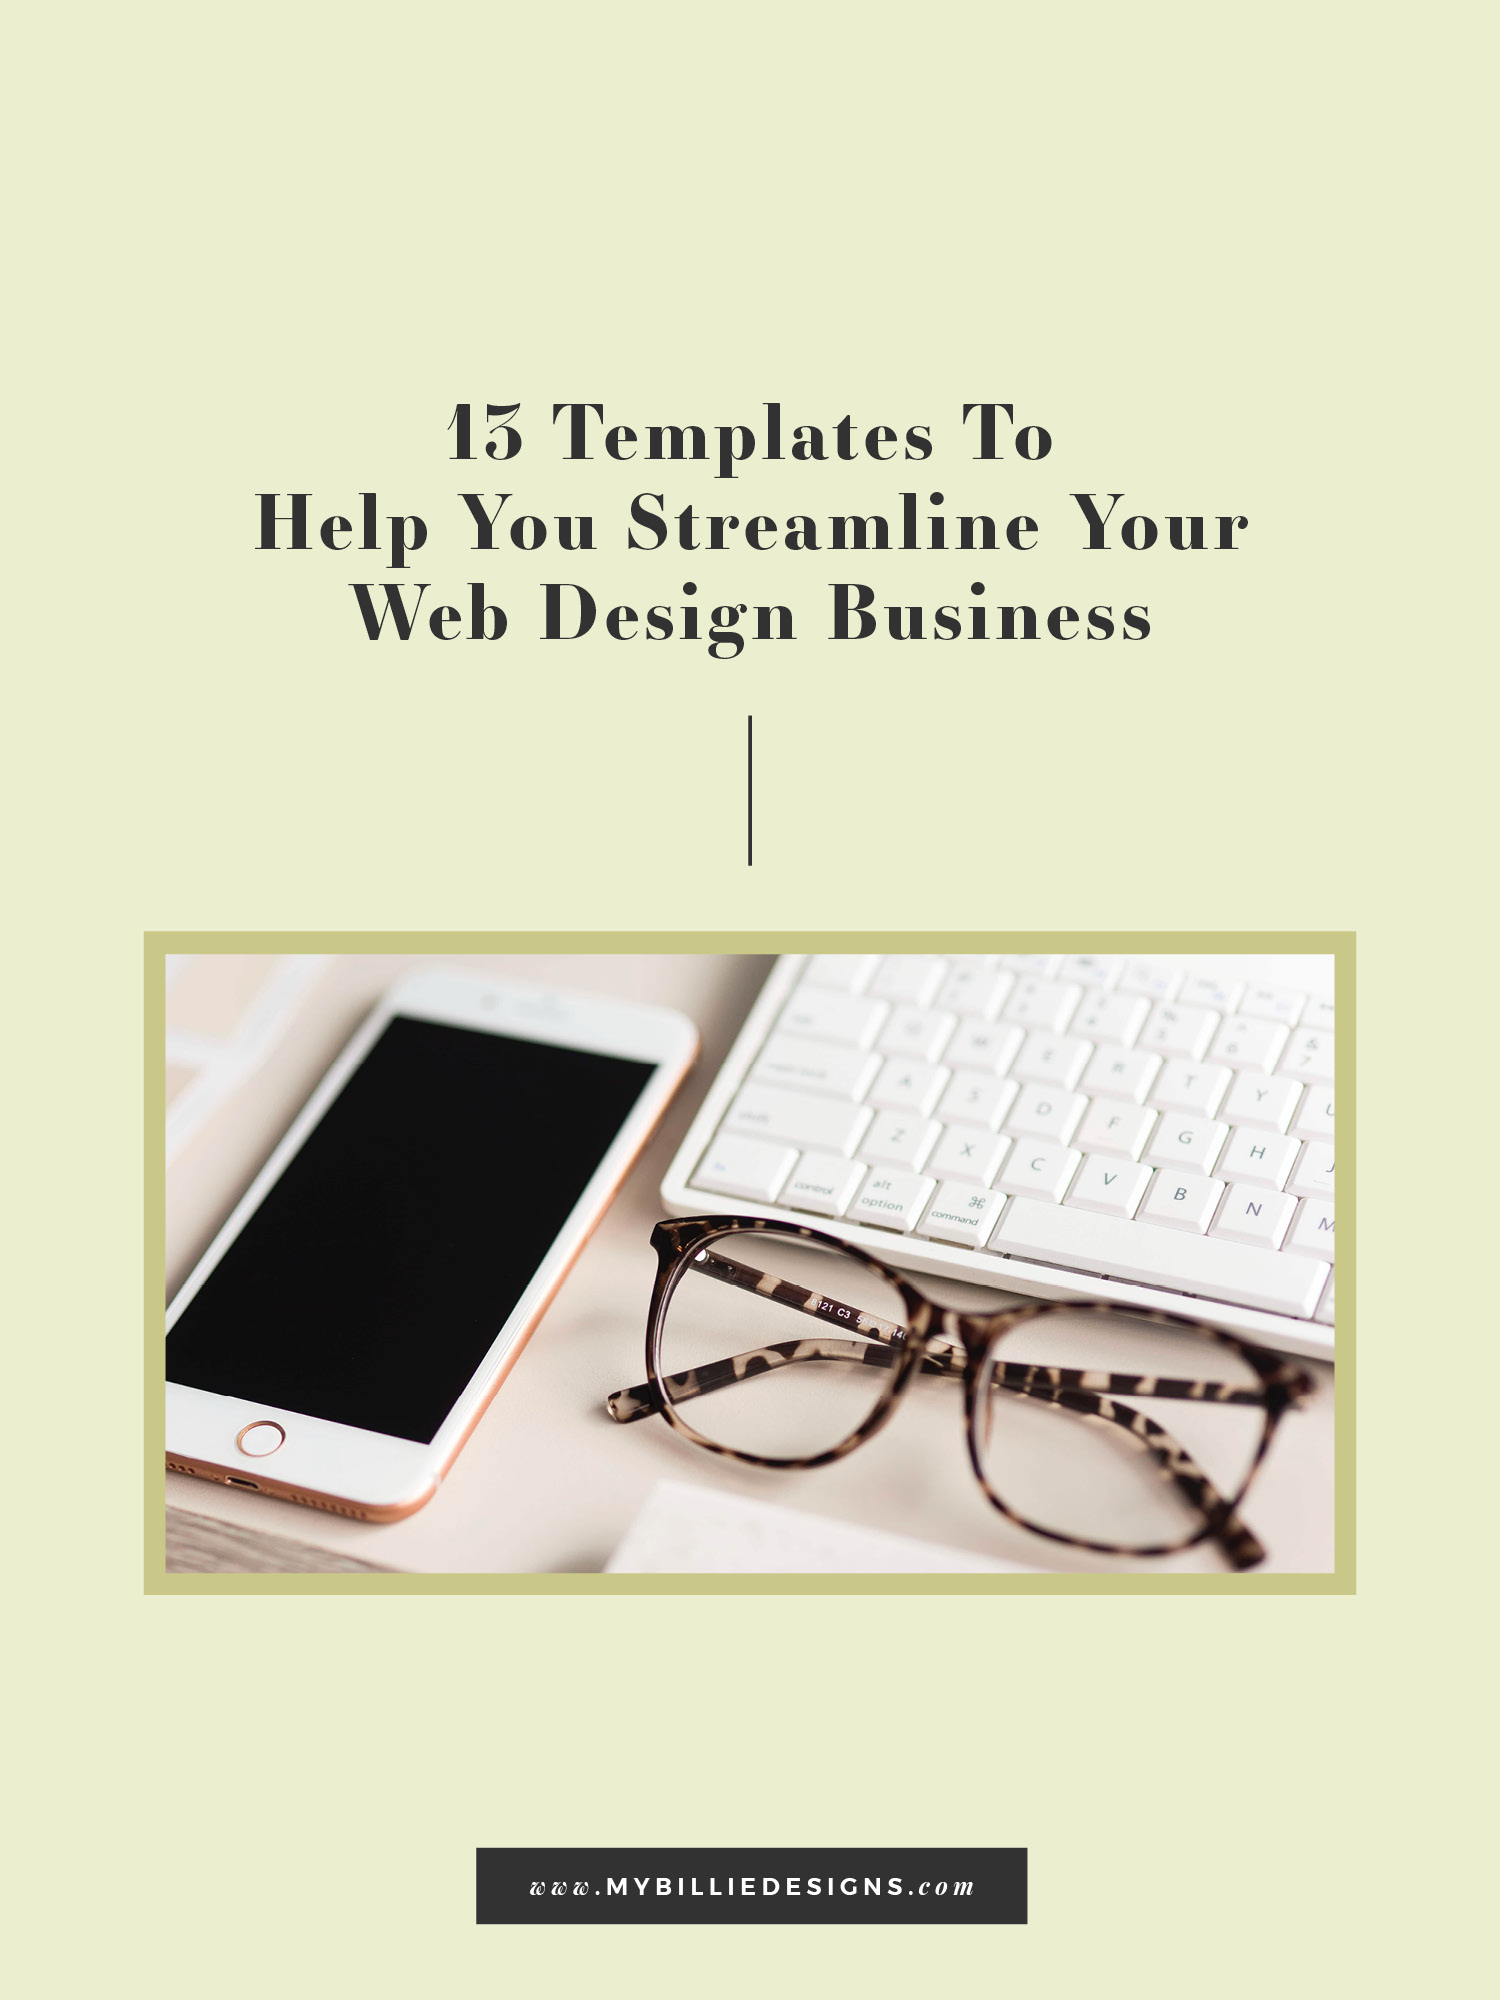 13 templates for your web design biz 4.jpg